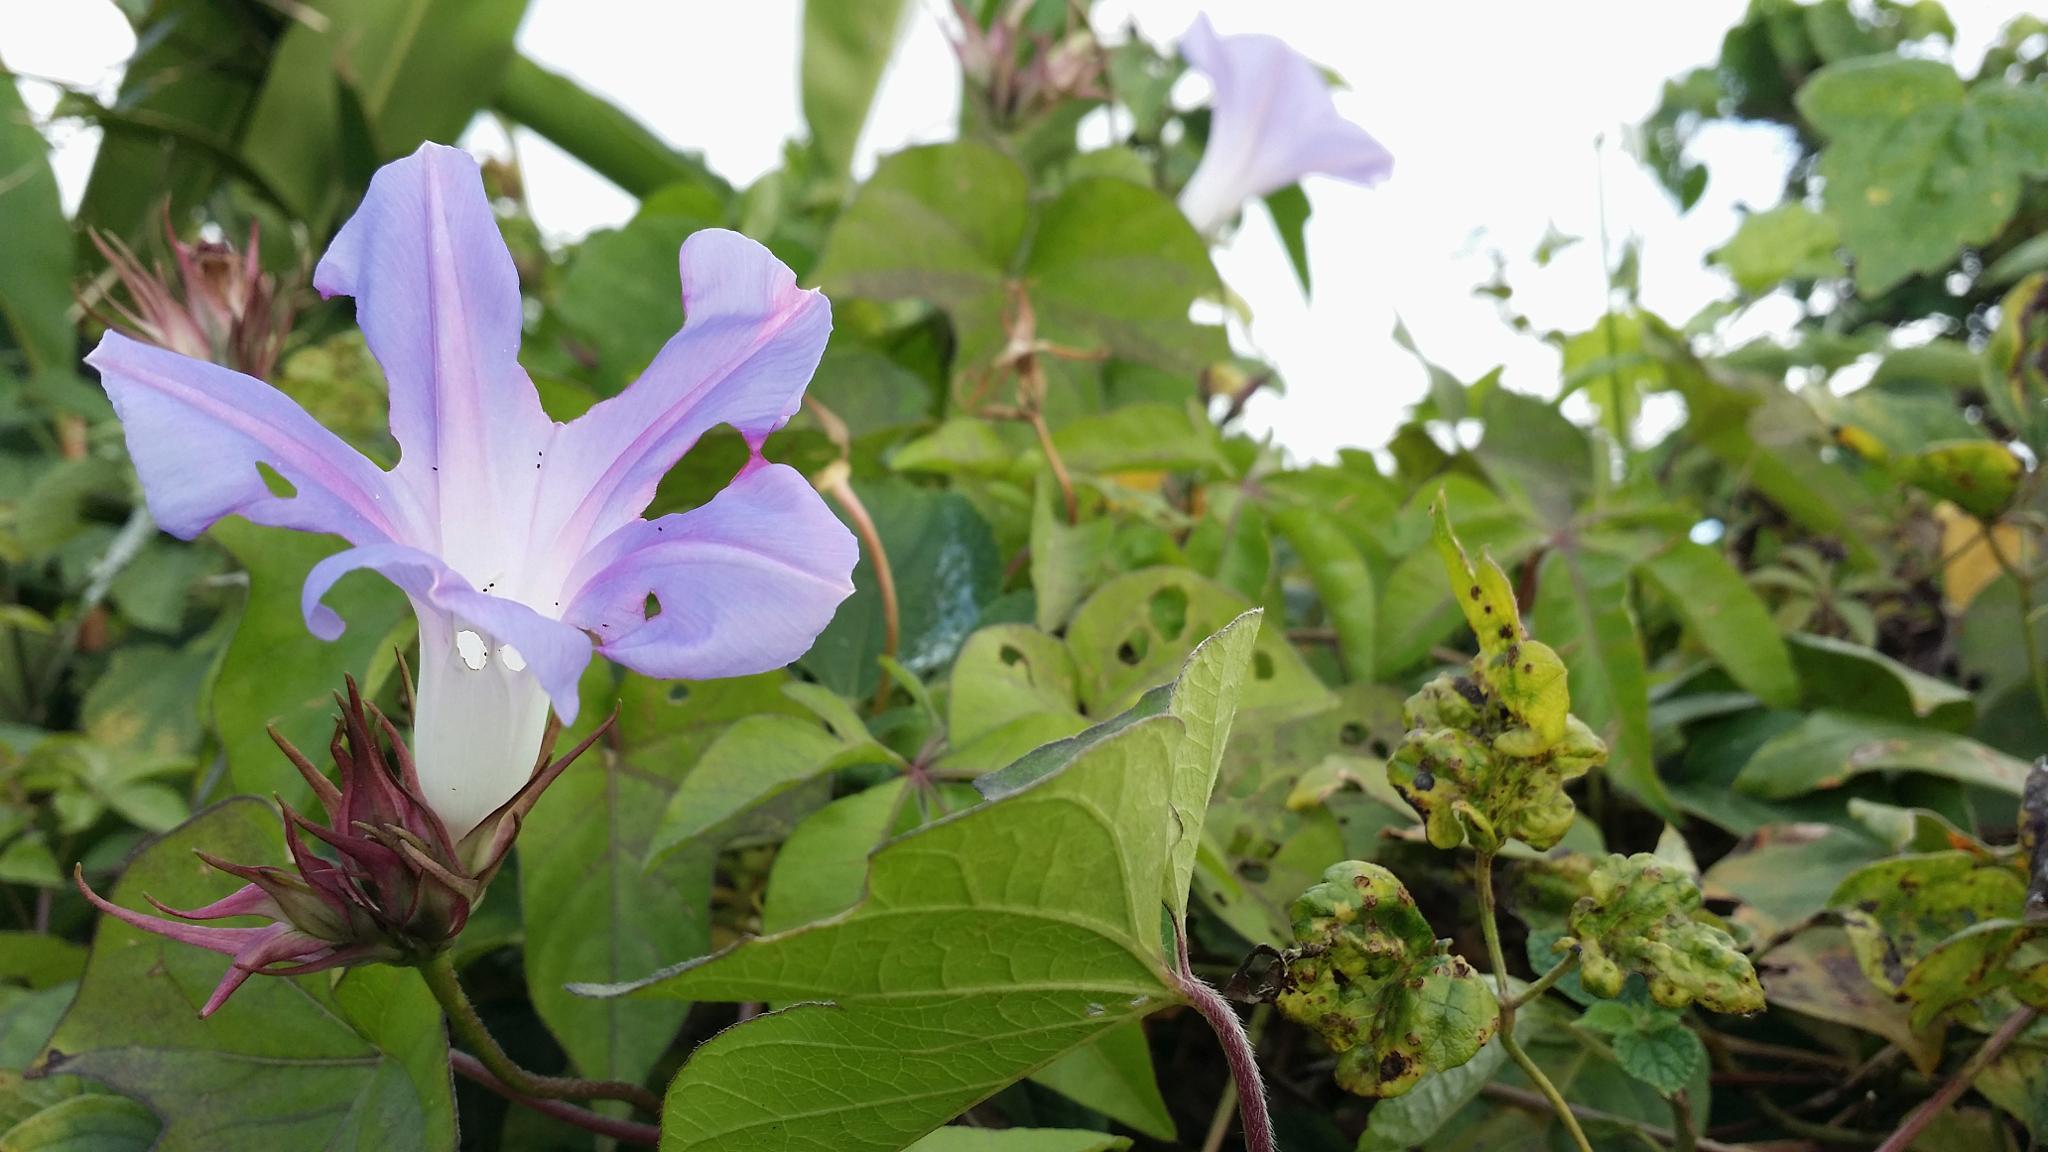 Ipomoea purpurea by NISHIHATA Osahiro